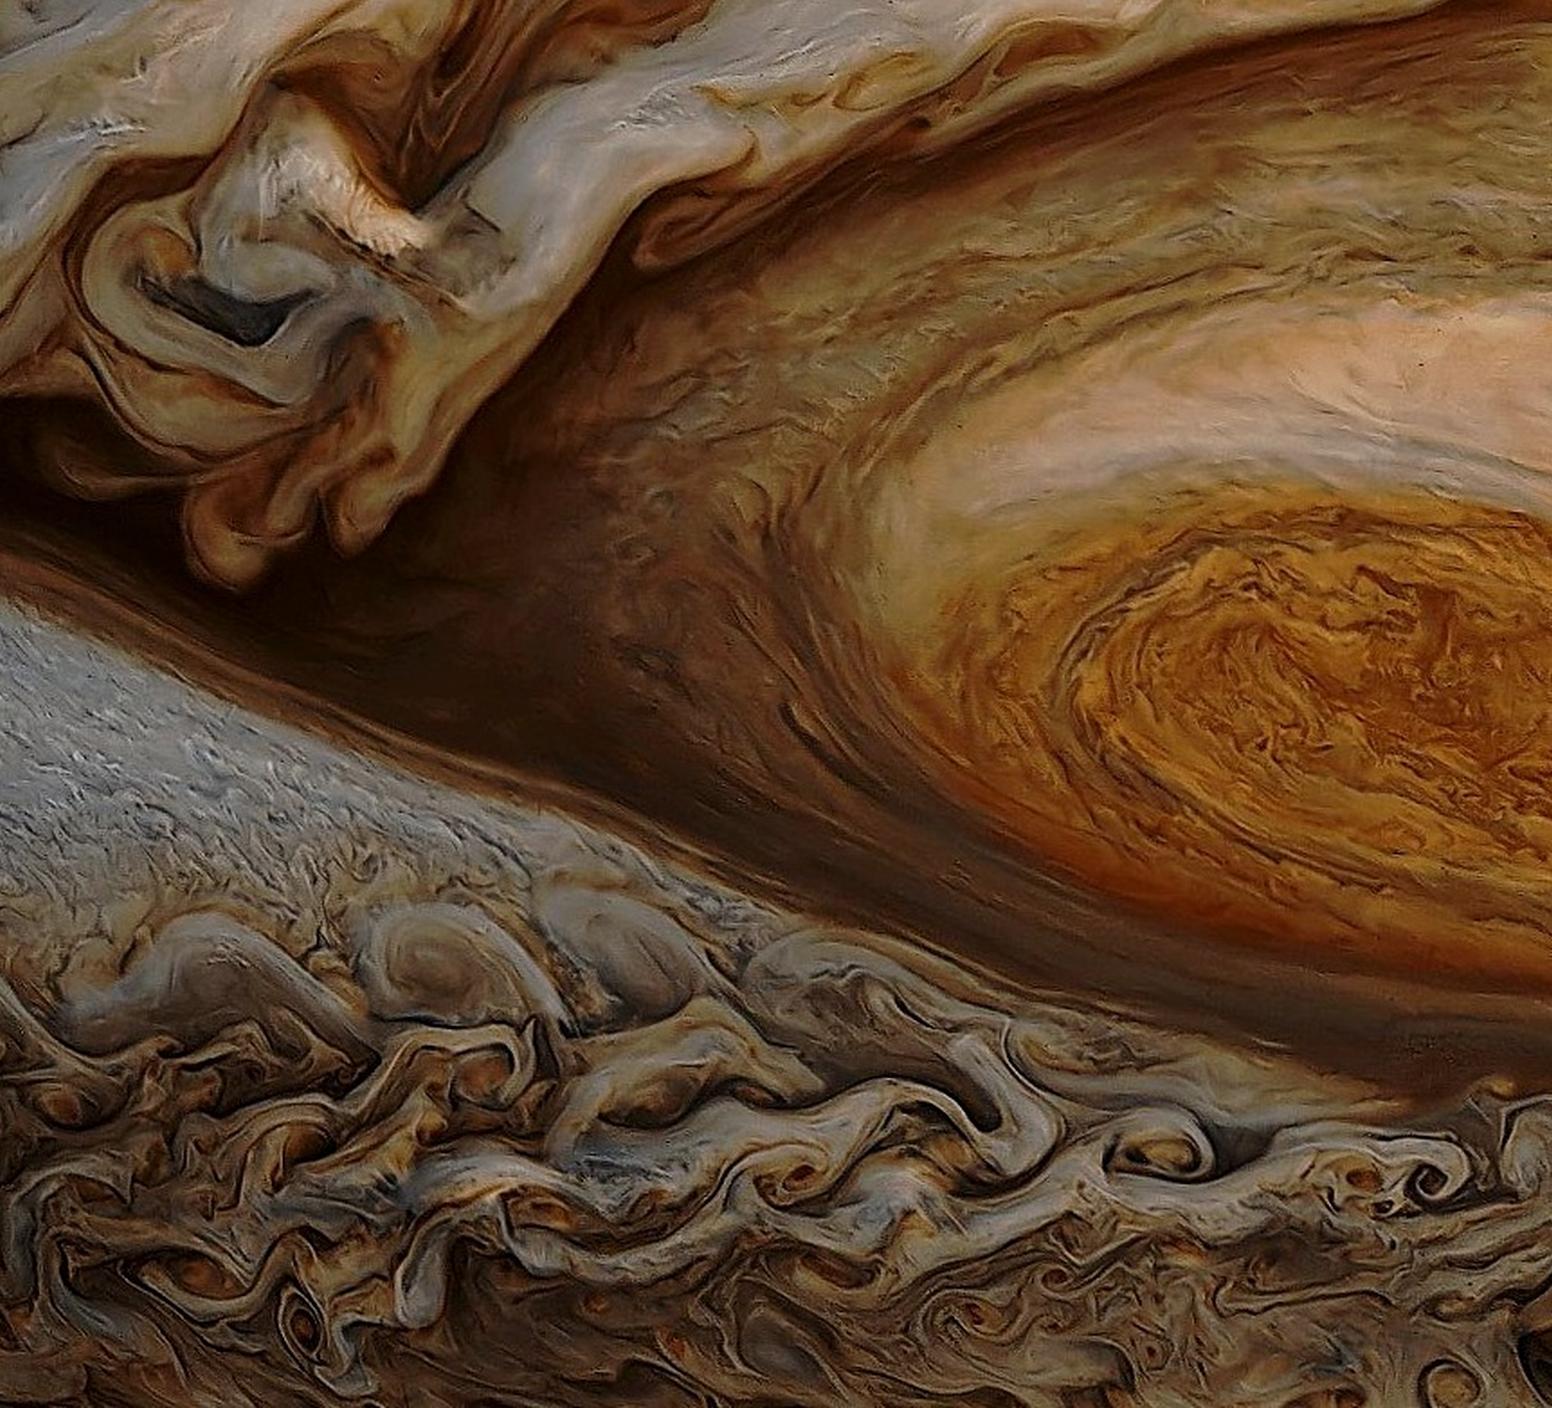 Jupiter close-ups | Close up of Jupiter's giant storm | The Omnichronicle